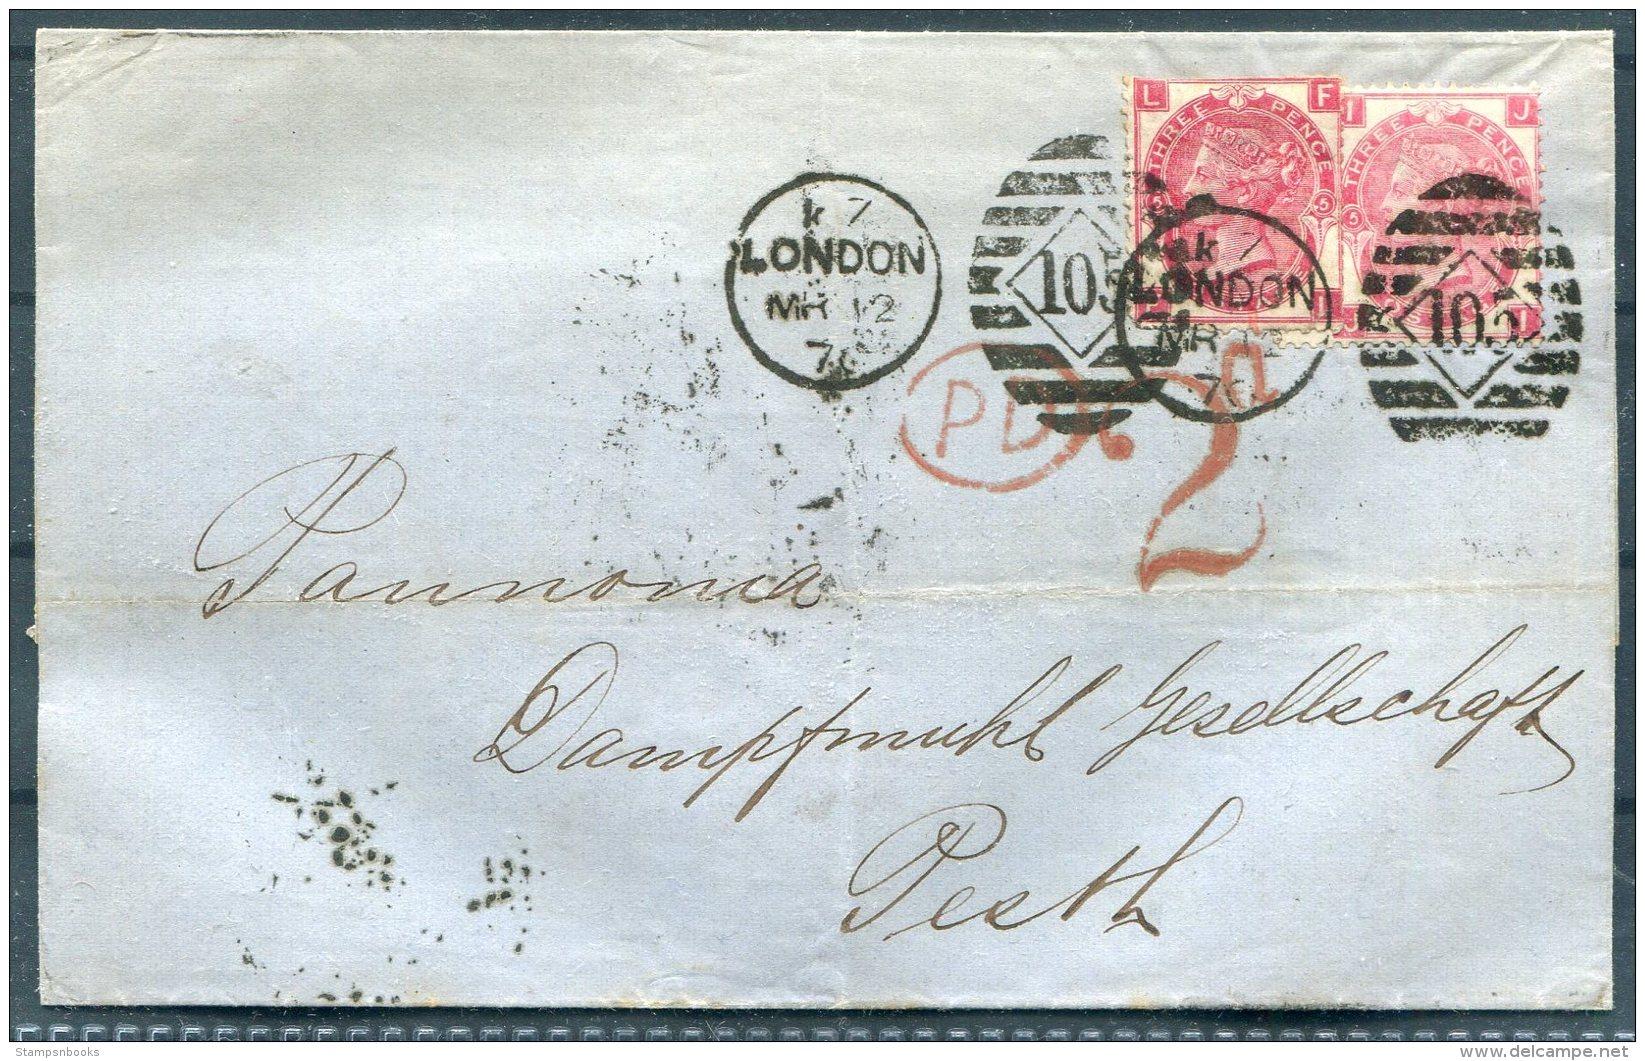 1870 GB QV 3d Rose (Plate 5) X 2 London K7 105 Duplex - Pest, Hungary Via Wien. Accountancy Handstamp - 1840-1901 (Victoria)